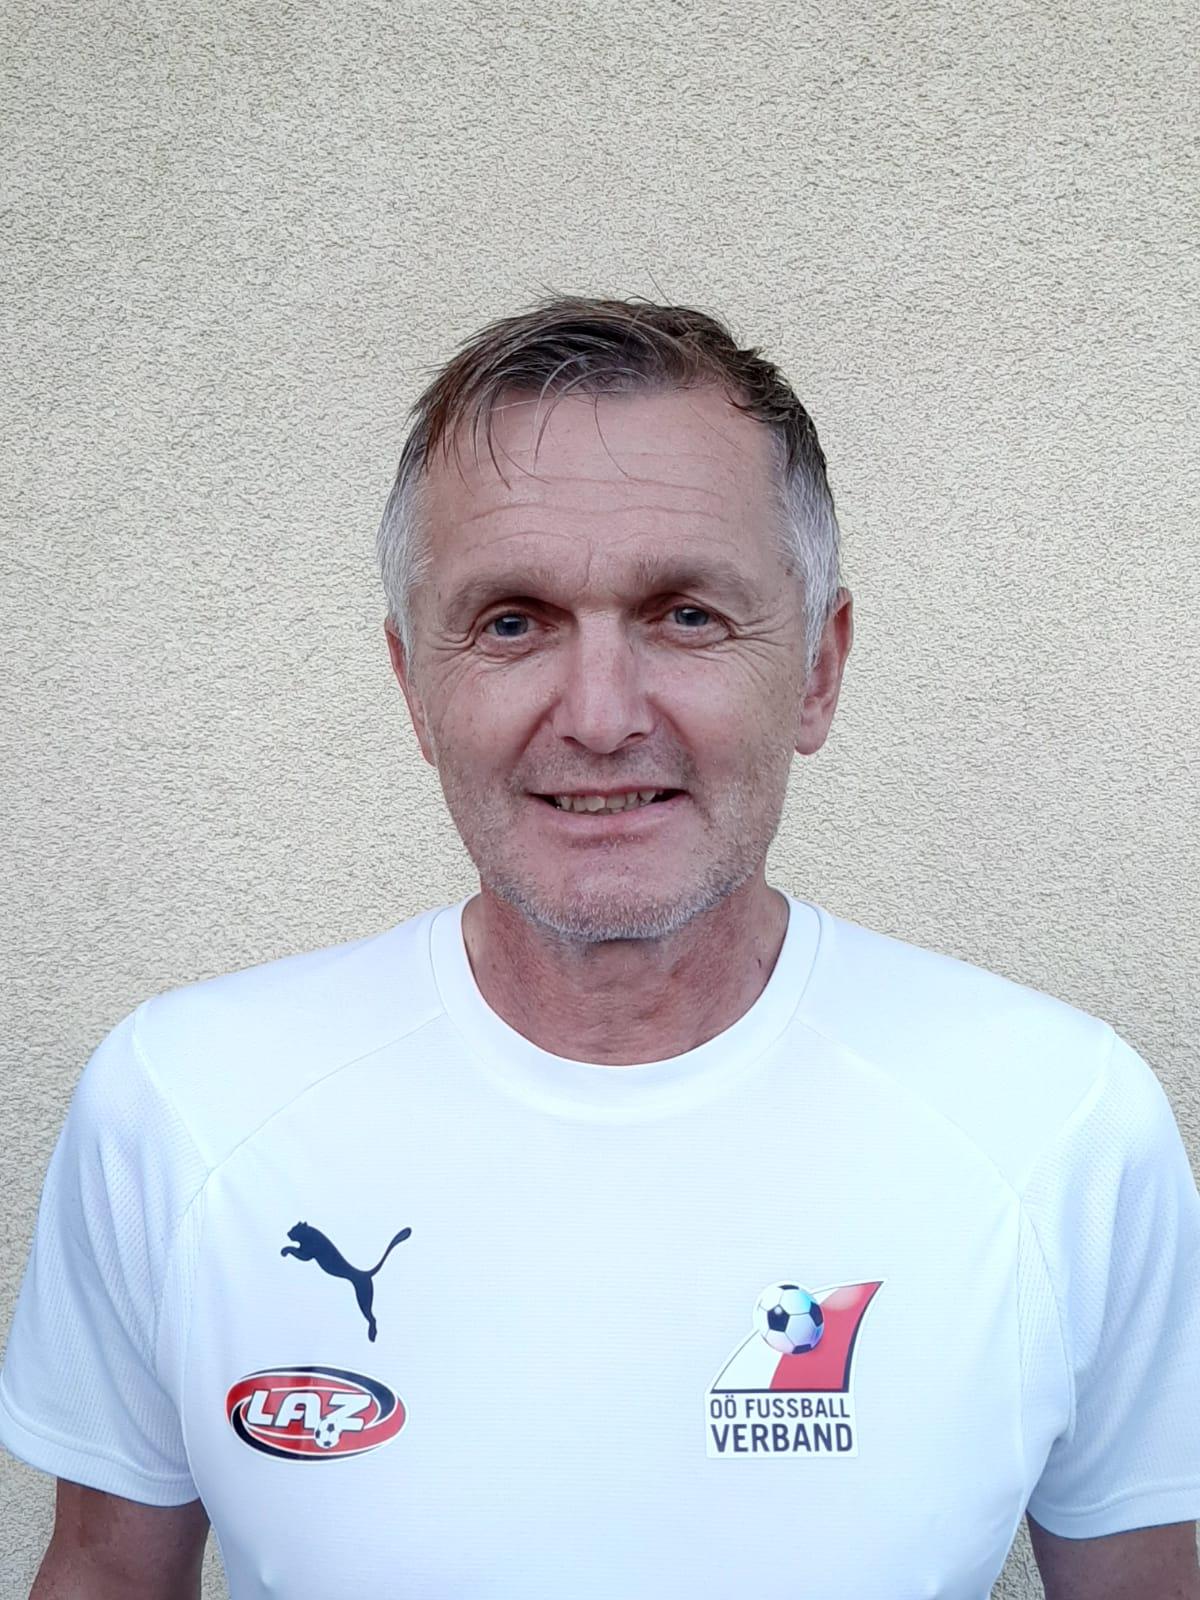 Josef Plöckinger